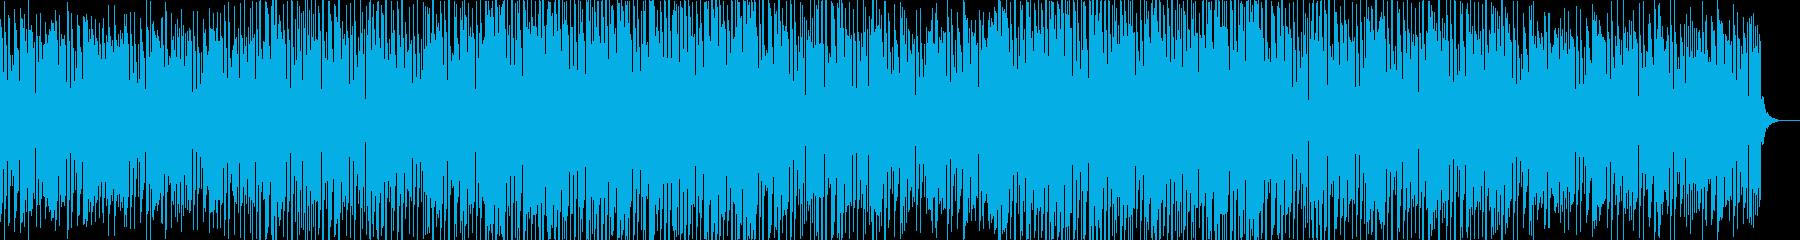 Lo-fiでミニマルVoxシンセが特徴的の再生済みの波形